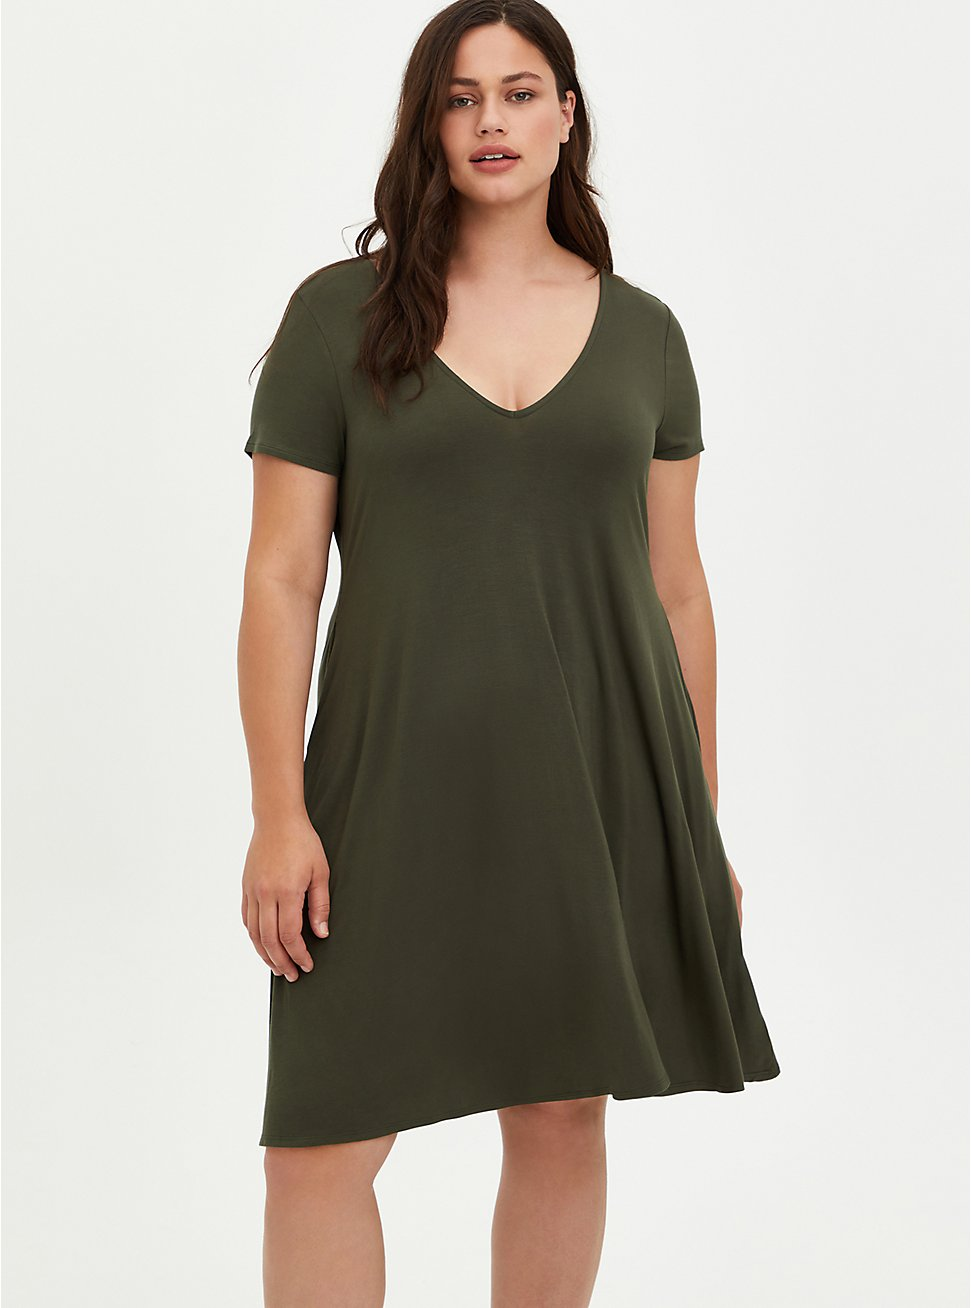 Fluted Mini Dress - Super Soft Olive, DEEP DEPTHS, hi-res